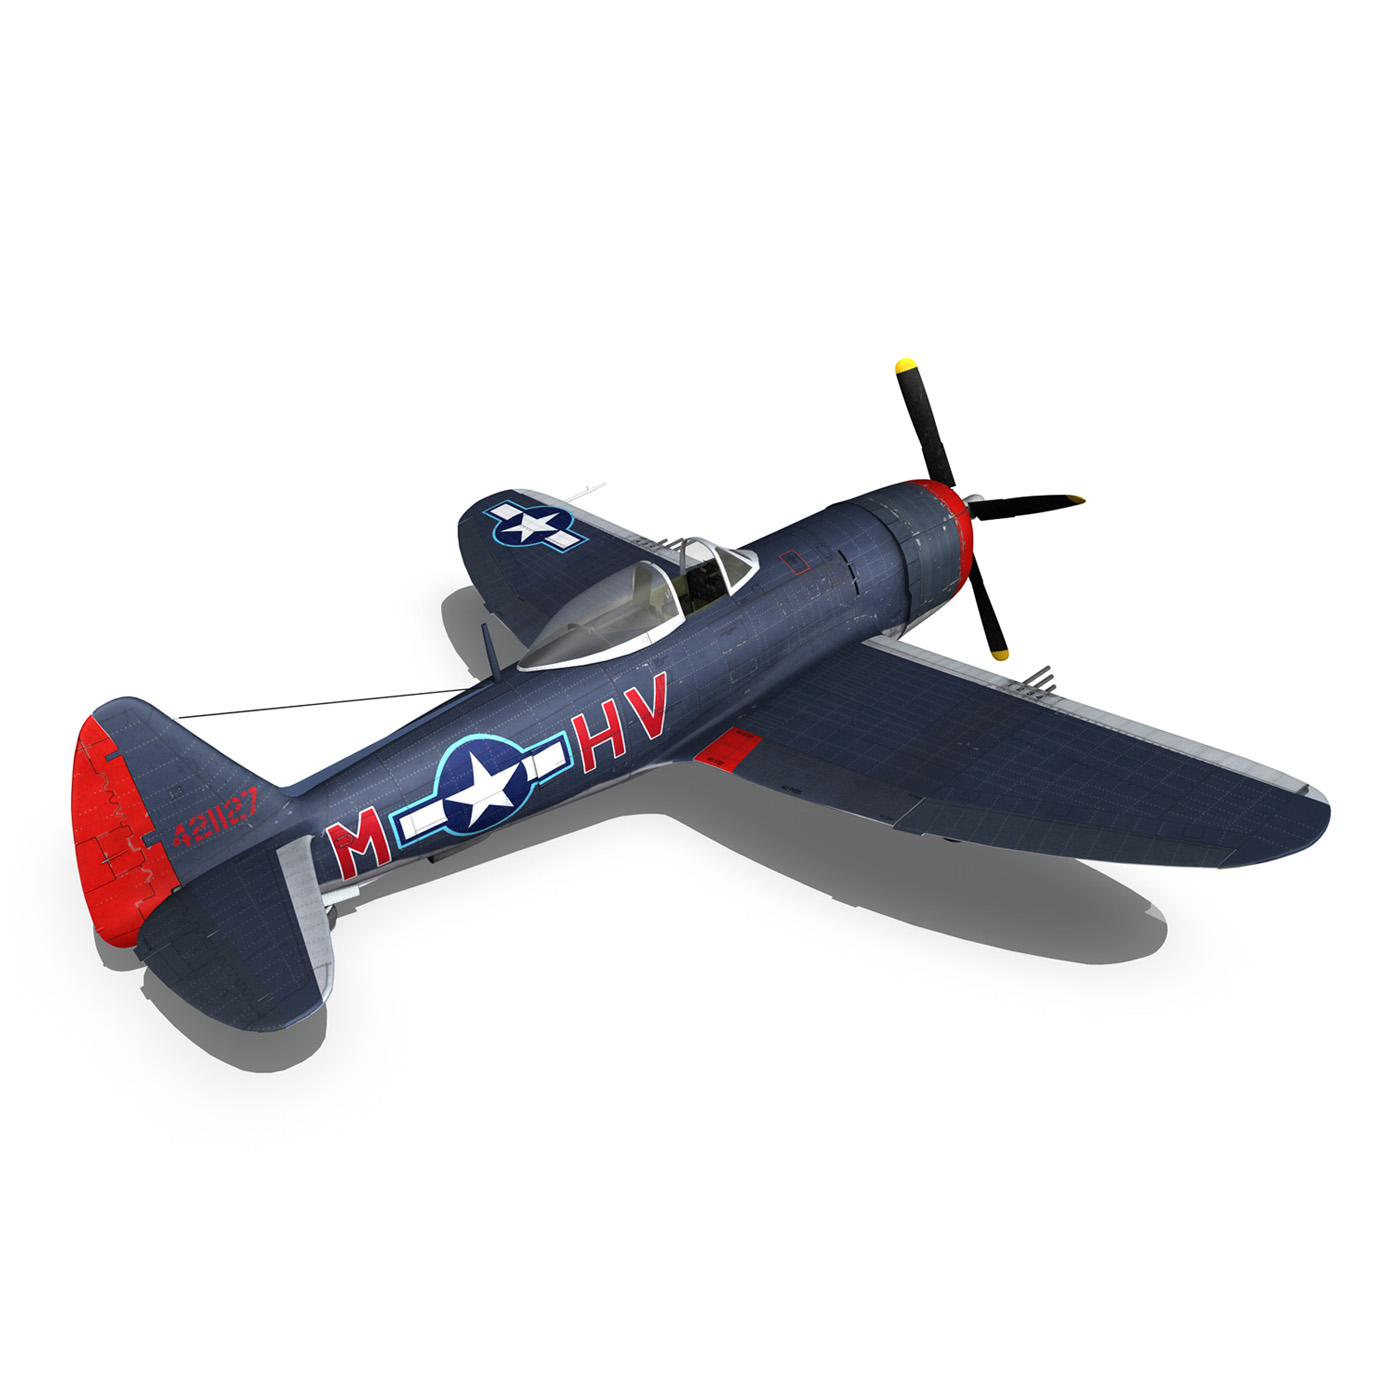 republic p-47m thunderbolt – pengie v 3d model 3ds c4d fbx lwo lw lws obj 279728